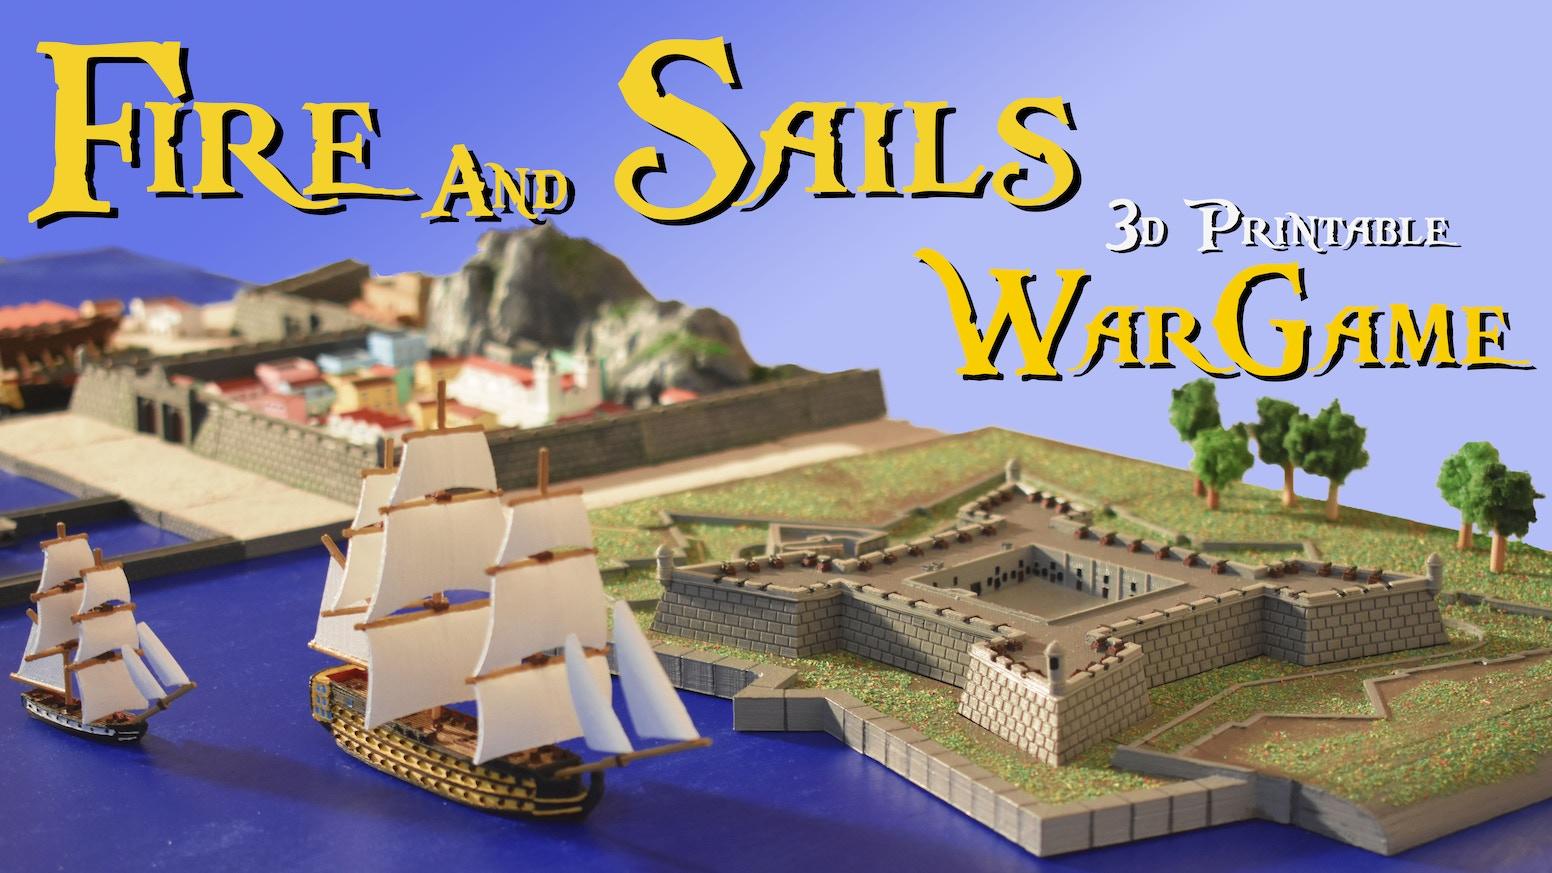 3d printable naval wargame. Download, print and play.